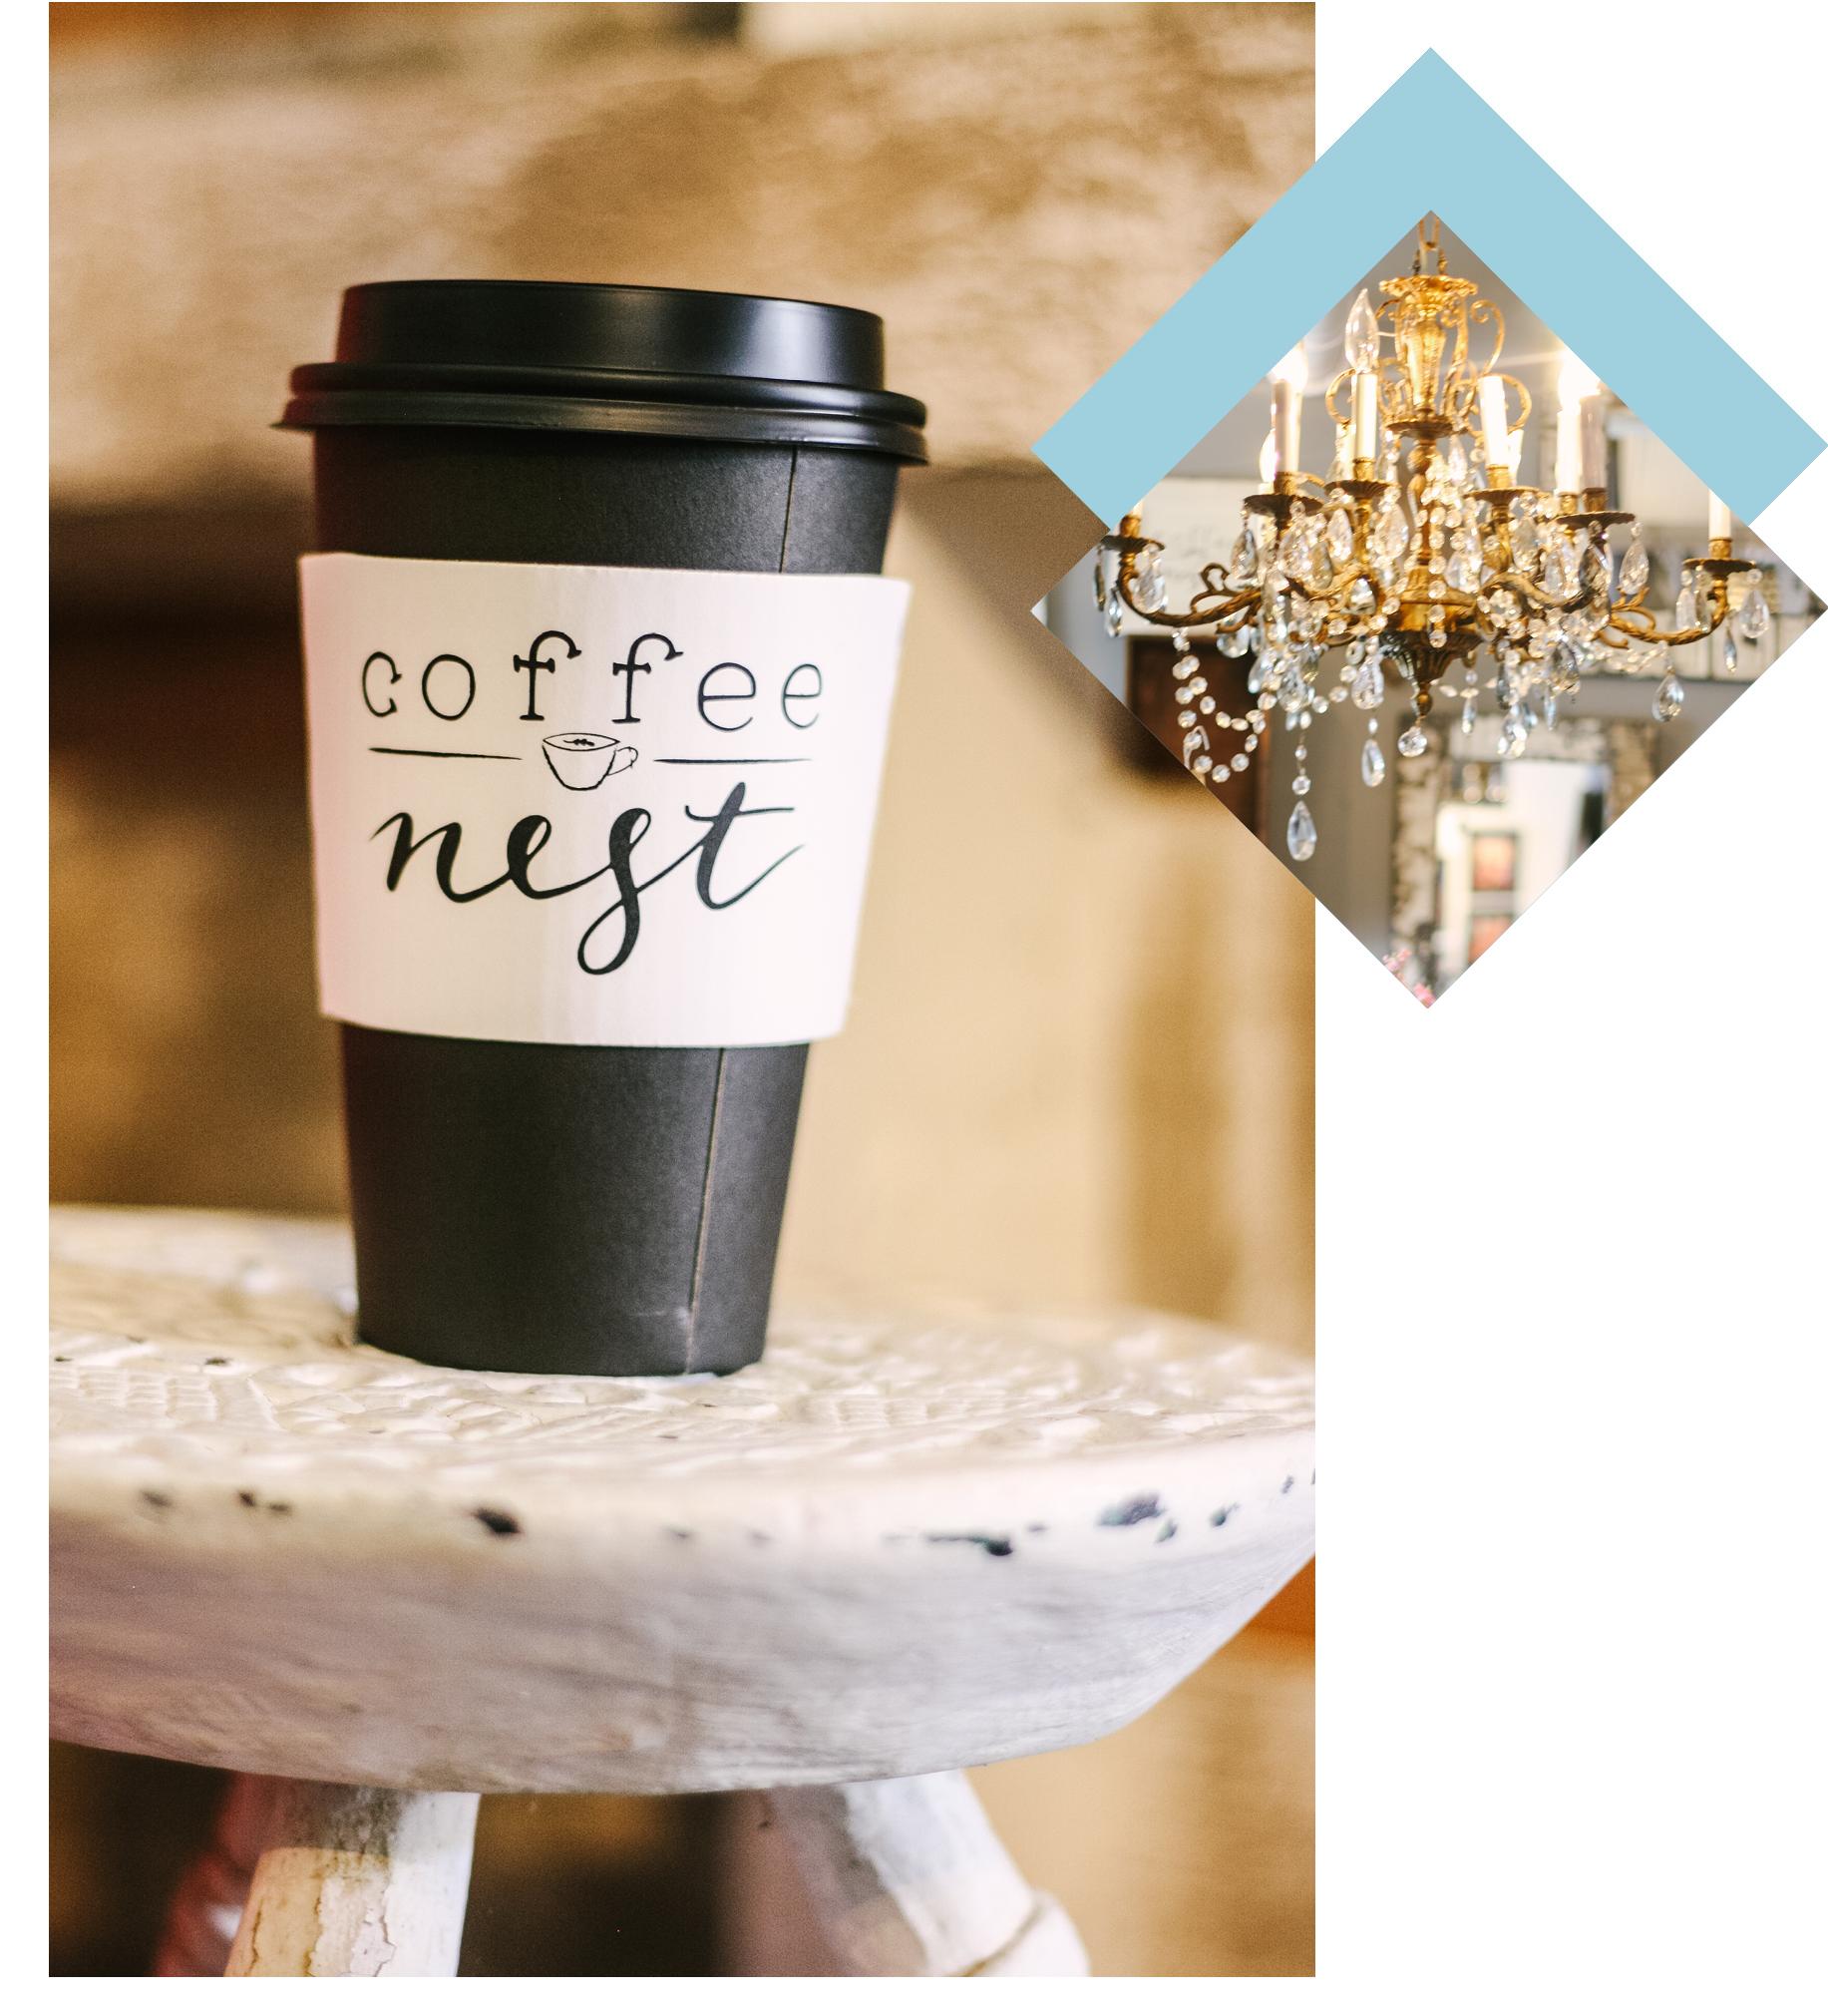 Coffee Nest Contact